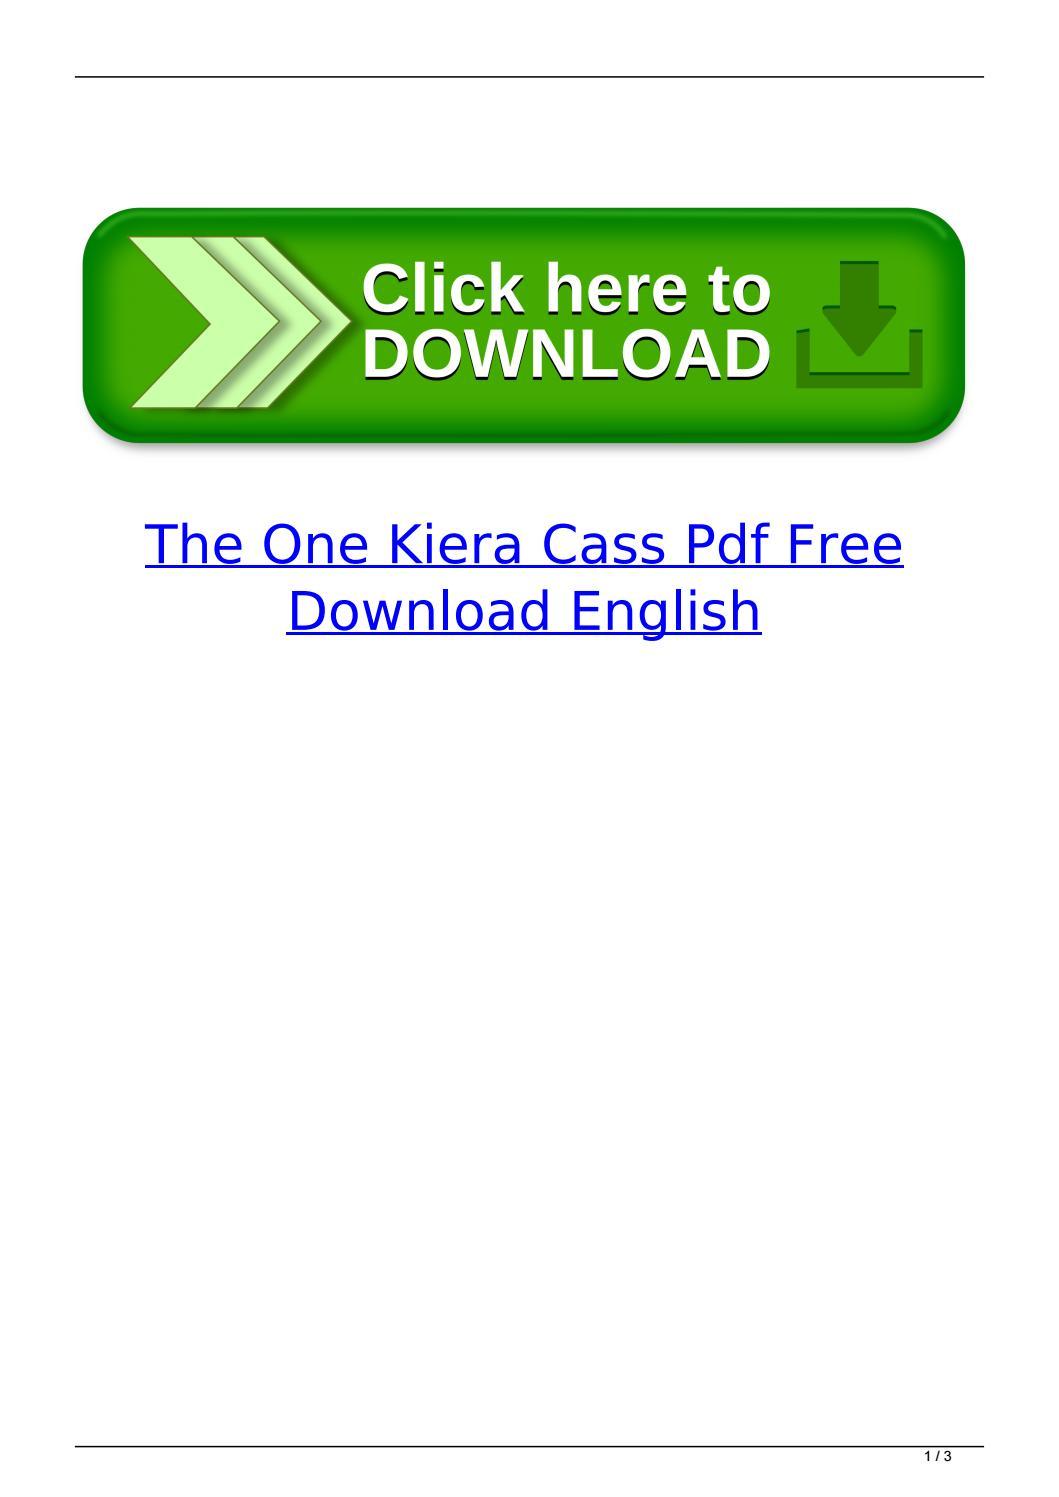 The One Kiera Cass Pdf Free Download